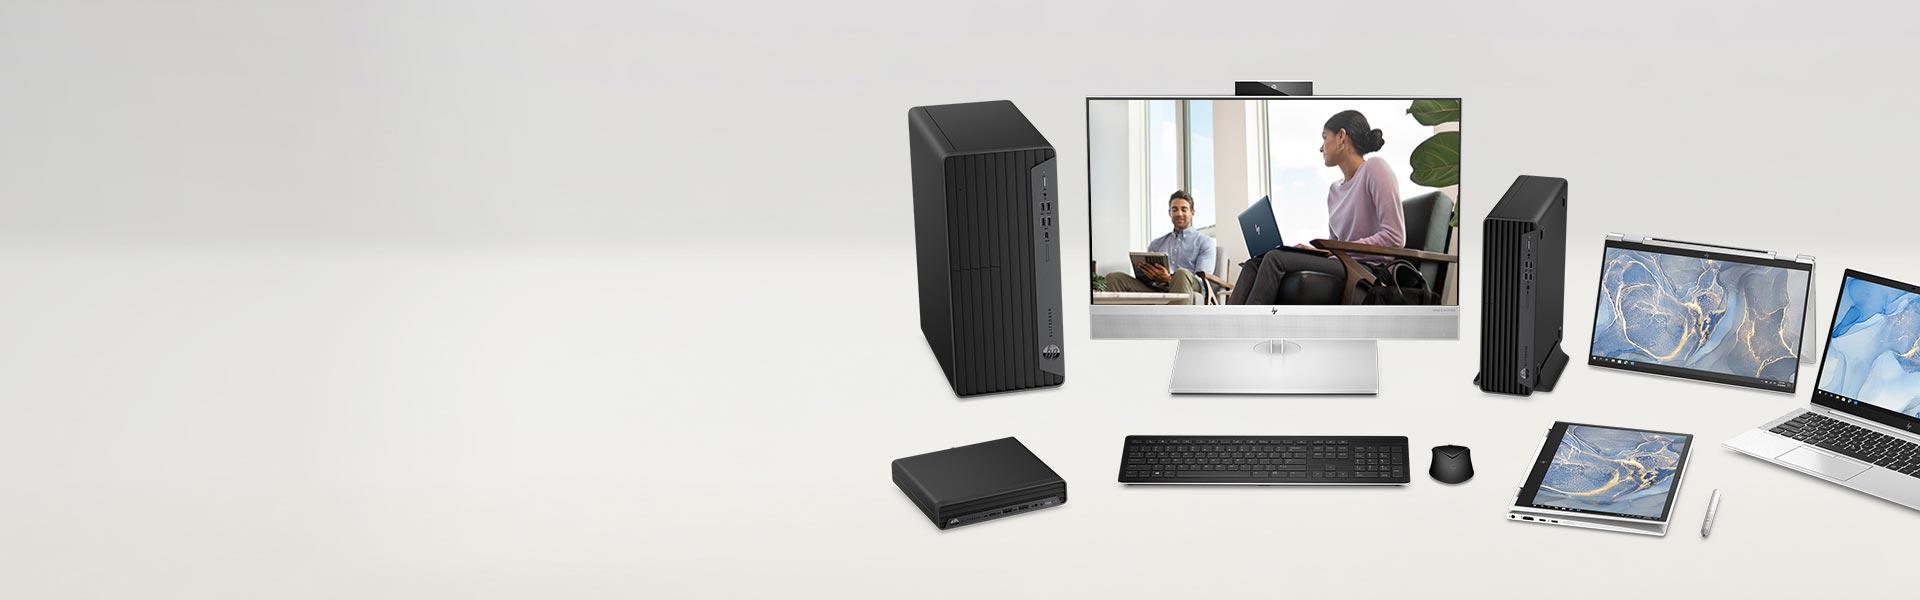 Desktops Business